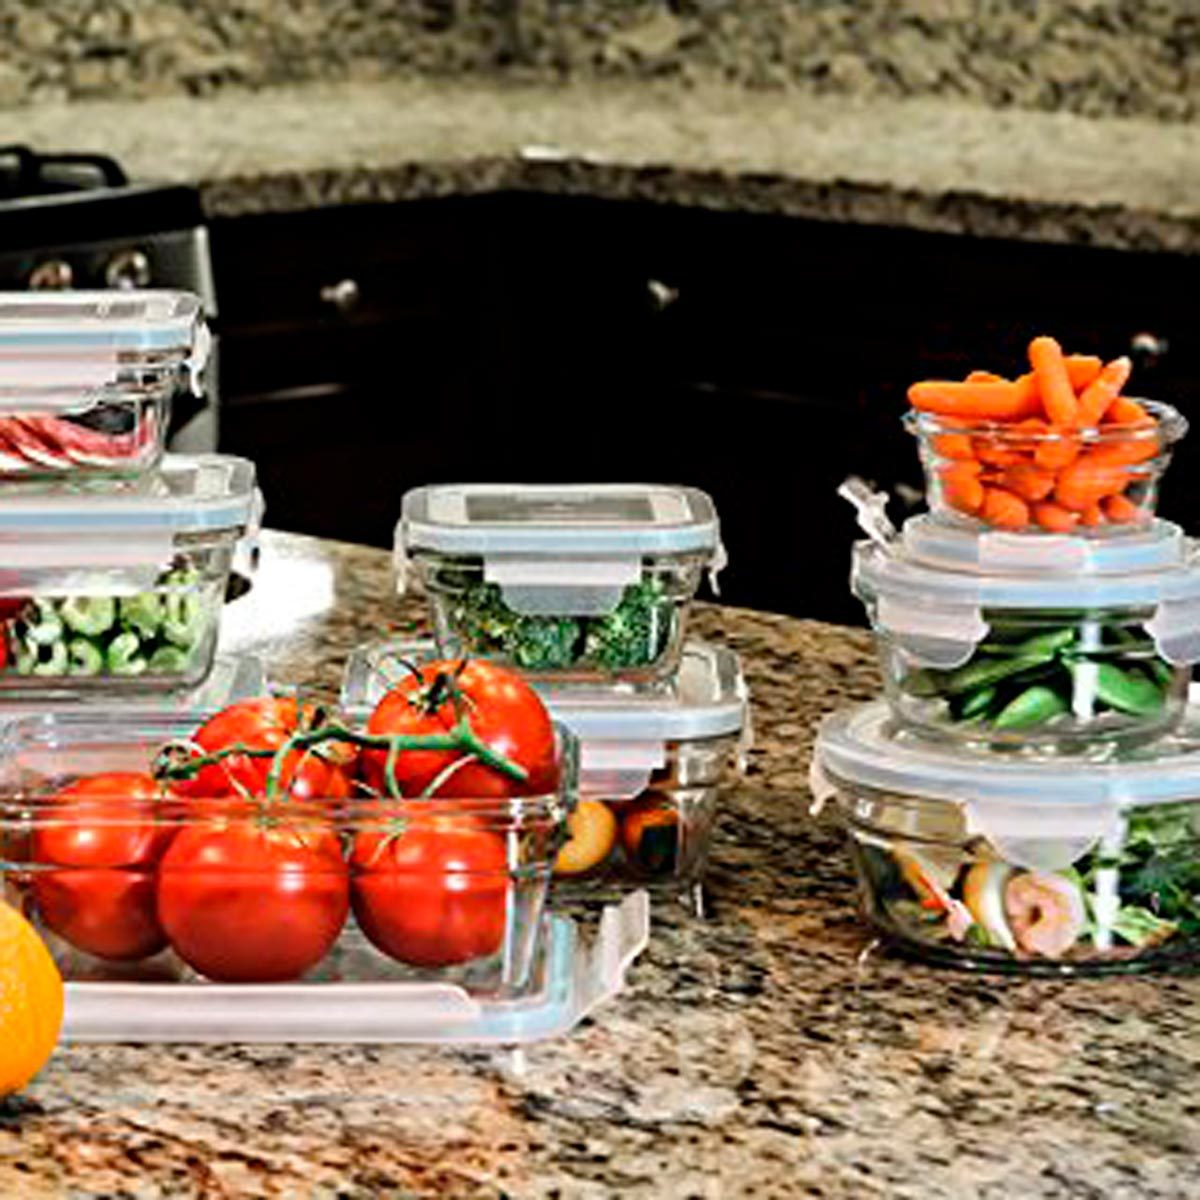 Glasslock 18-Piece Oven-Safe Container Set